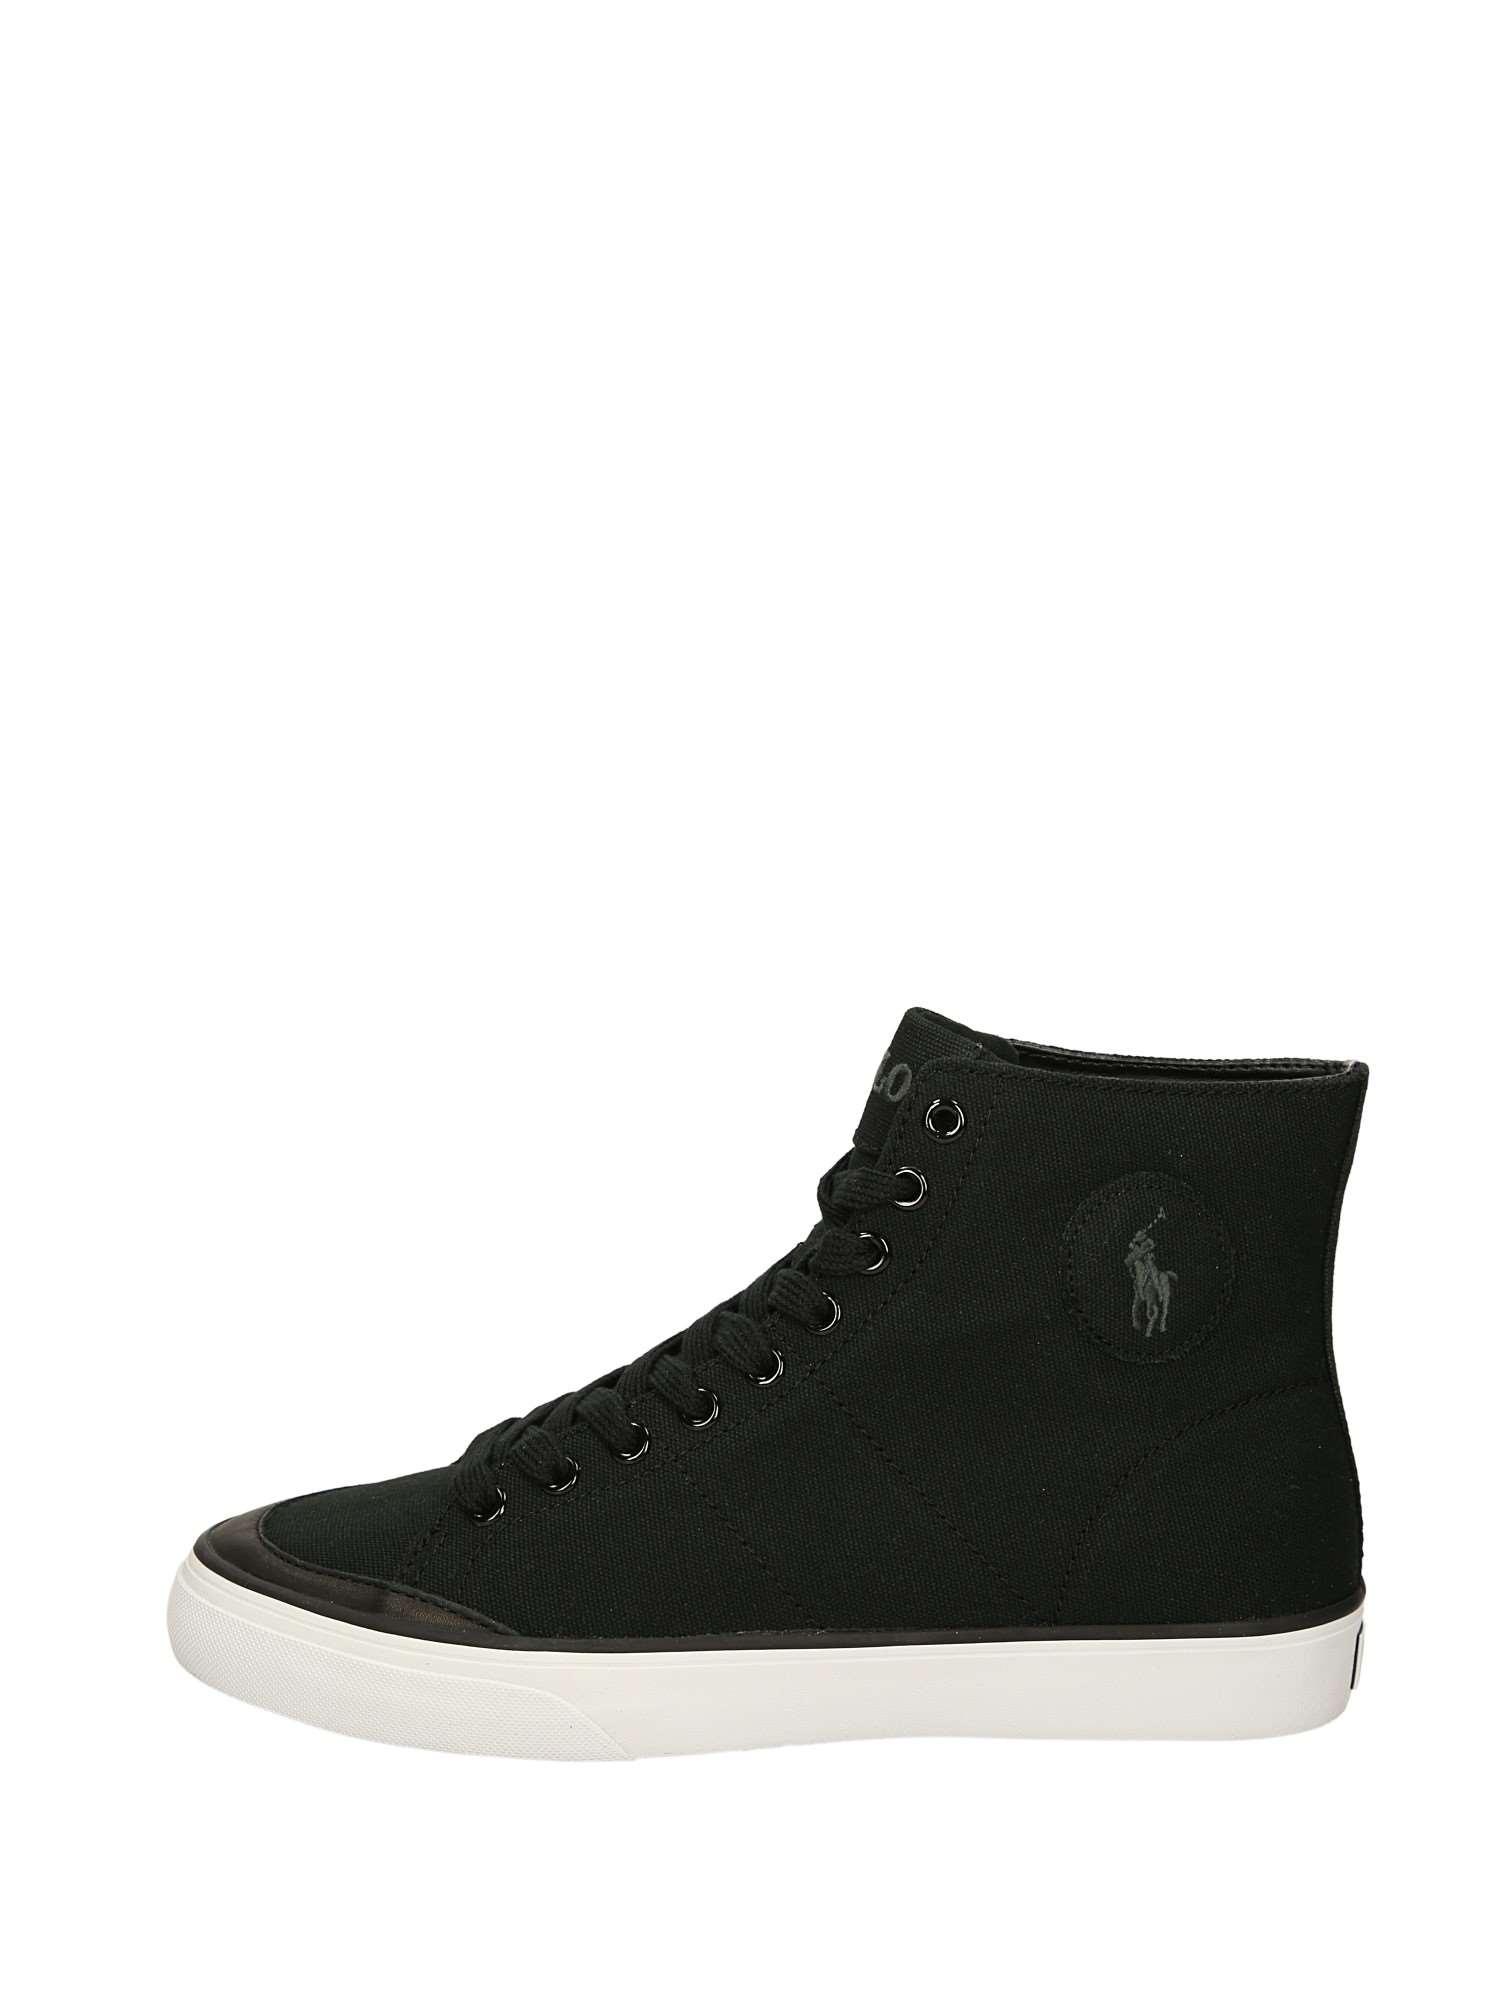 wholesale dealer 2288f 24c79 Polo Ralph Lauren Sneakers Alte Uomo Nero | Lalilina